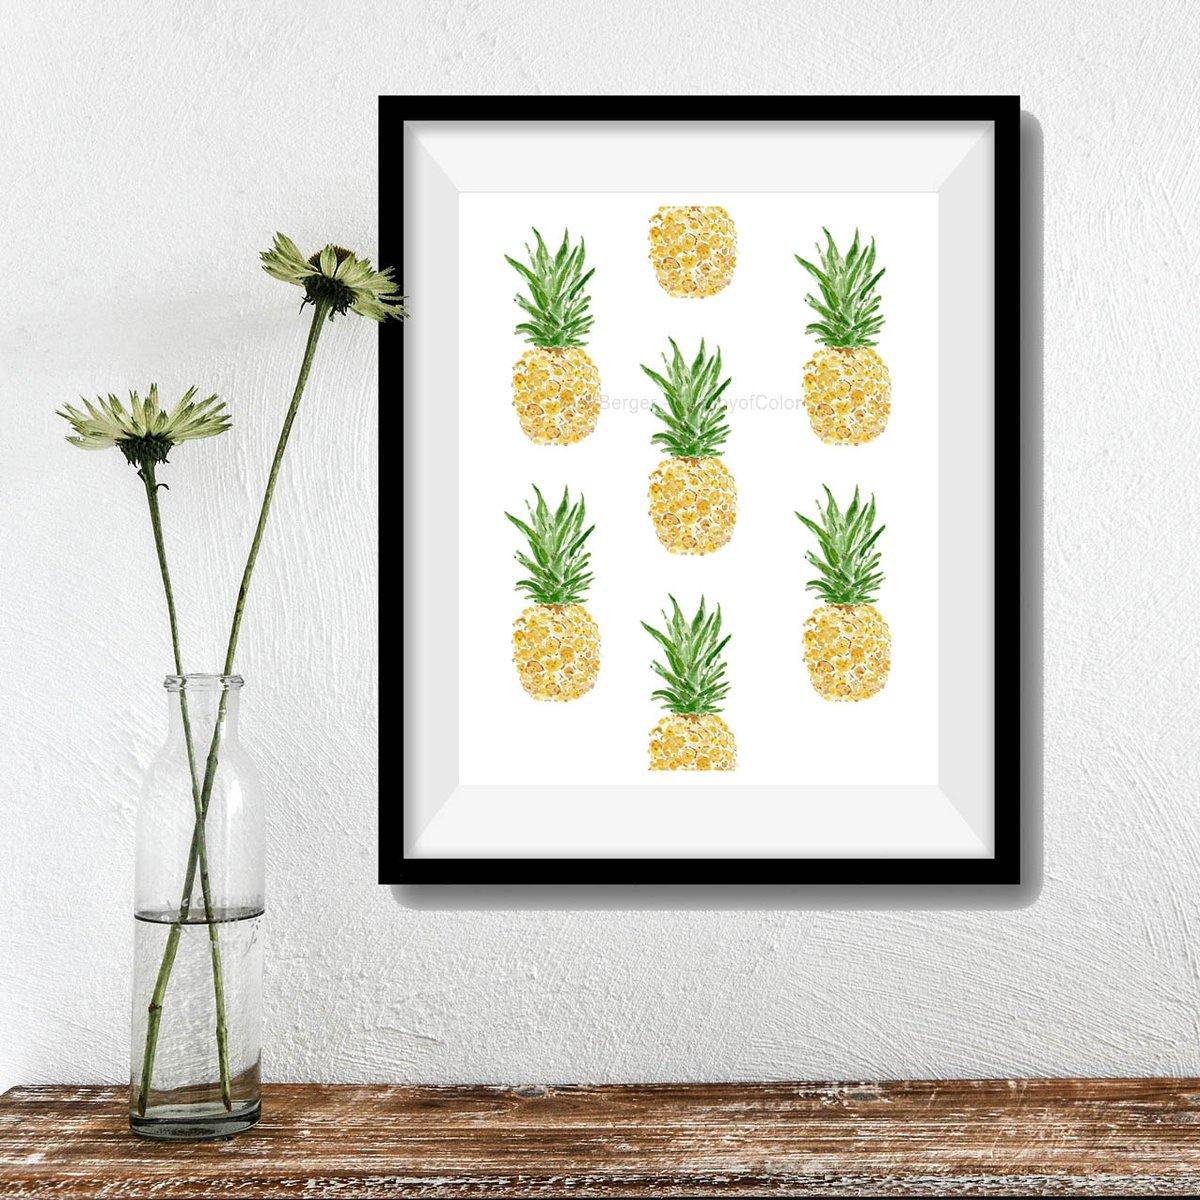 Pineapples tropical kitchen art  https://www. etsy.com/thejoyofcolor/ listing/201604253/pineapples-art-print-kitchen-art?ref=shop_home_active_2 &nbsp; …   #pineapple #tropical #artwork #kitchen #homedecor #tfoodie #art  #ftuitsart<br>http://pic.twitter.com/RhUsZpGul5